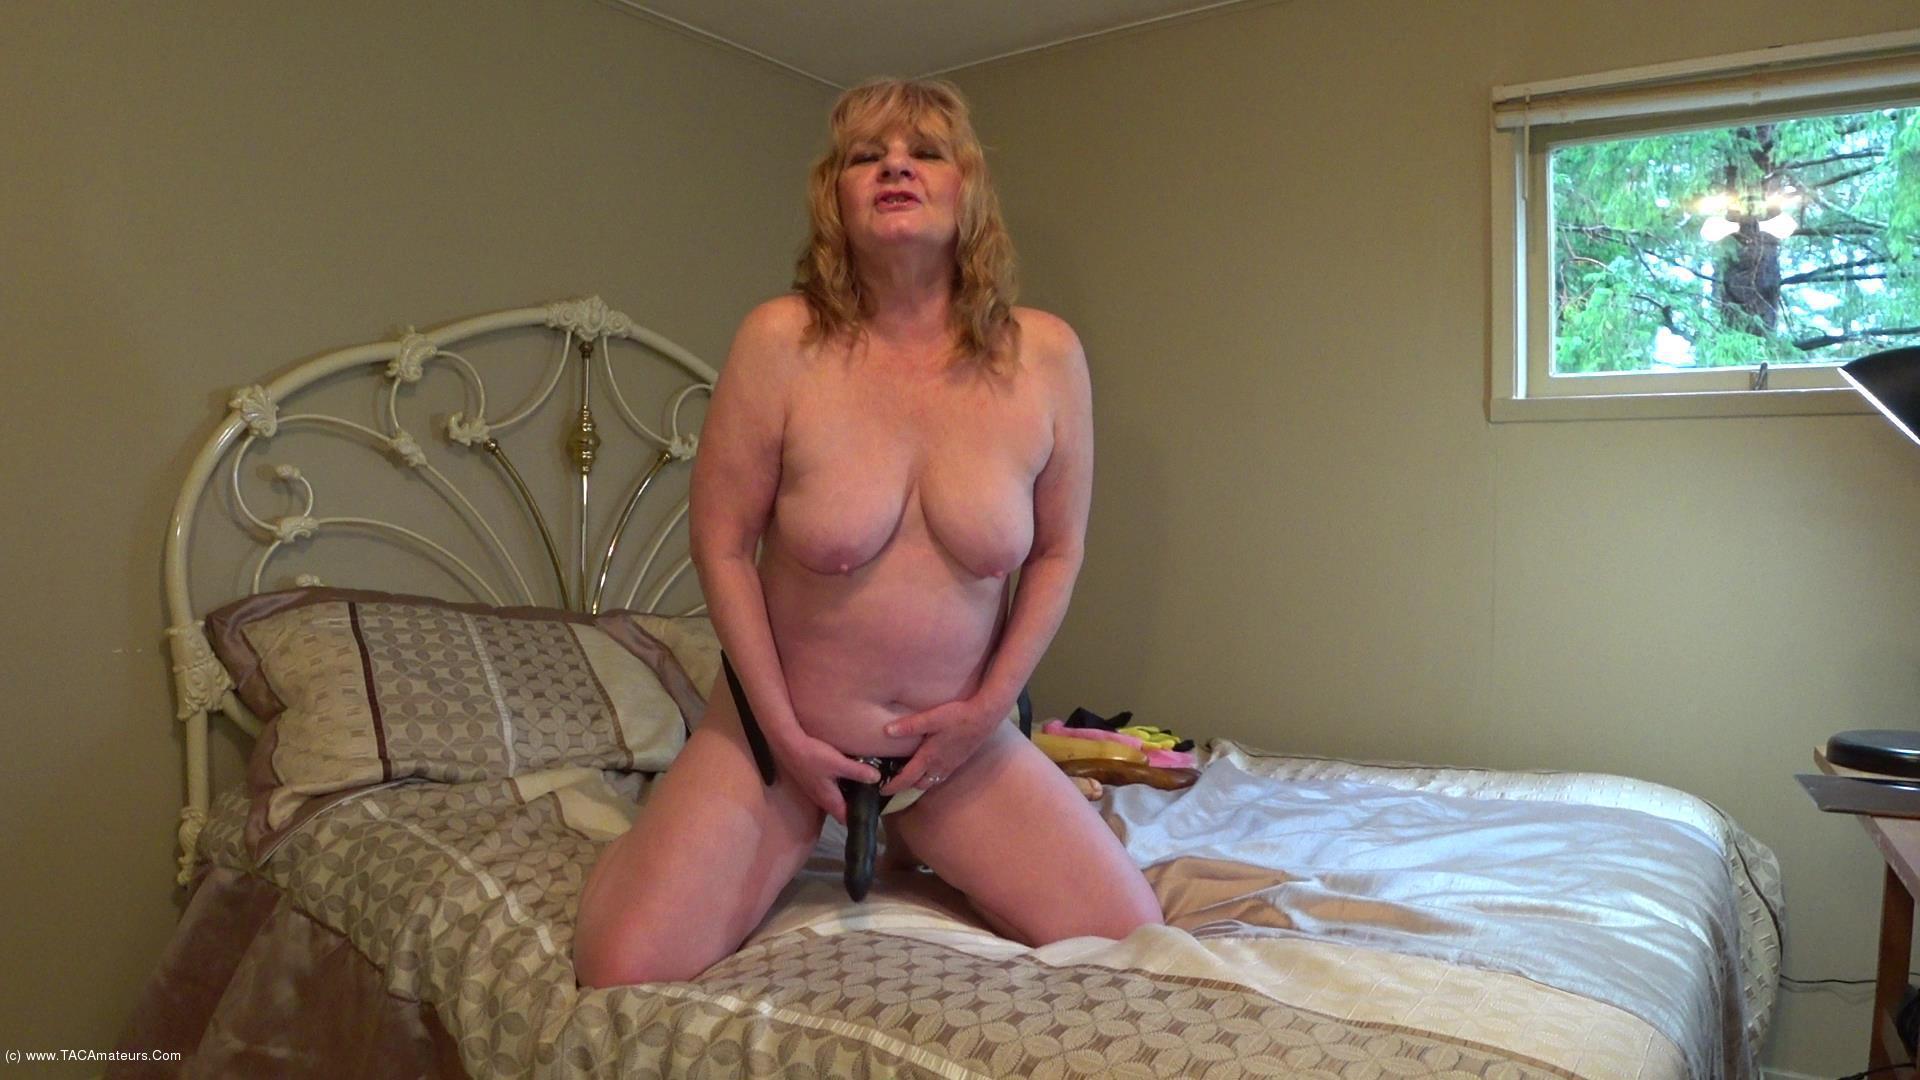 CougarBabeJolee - Sissy Boy Strap-on scene 0